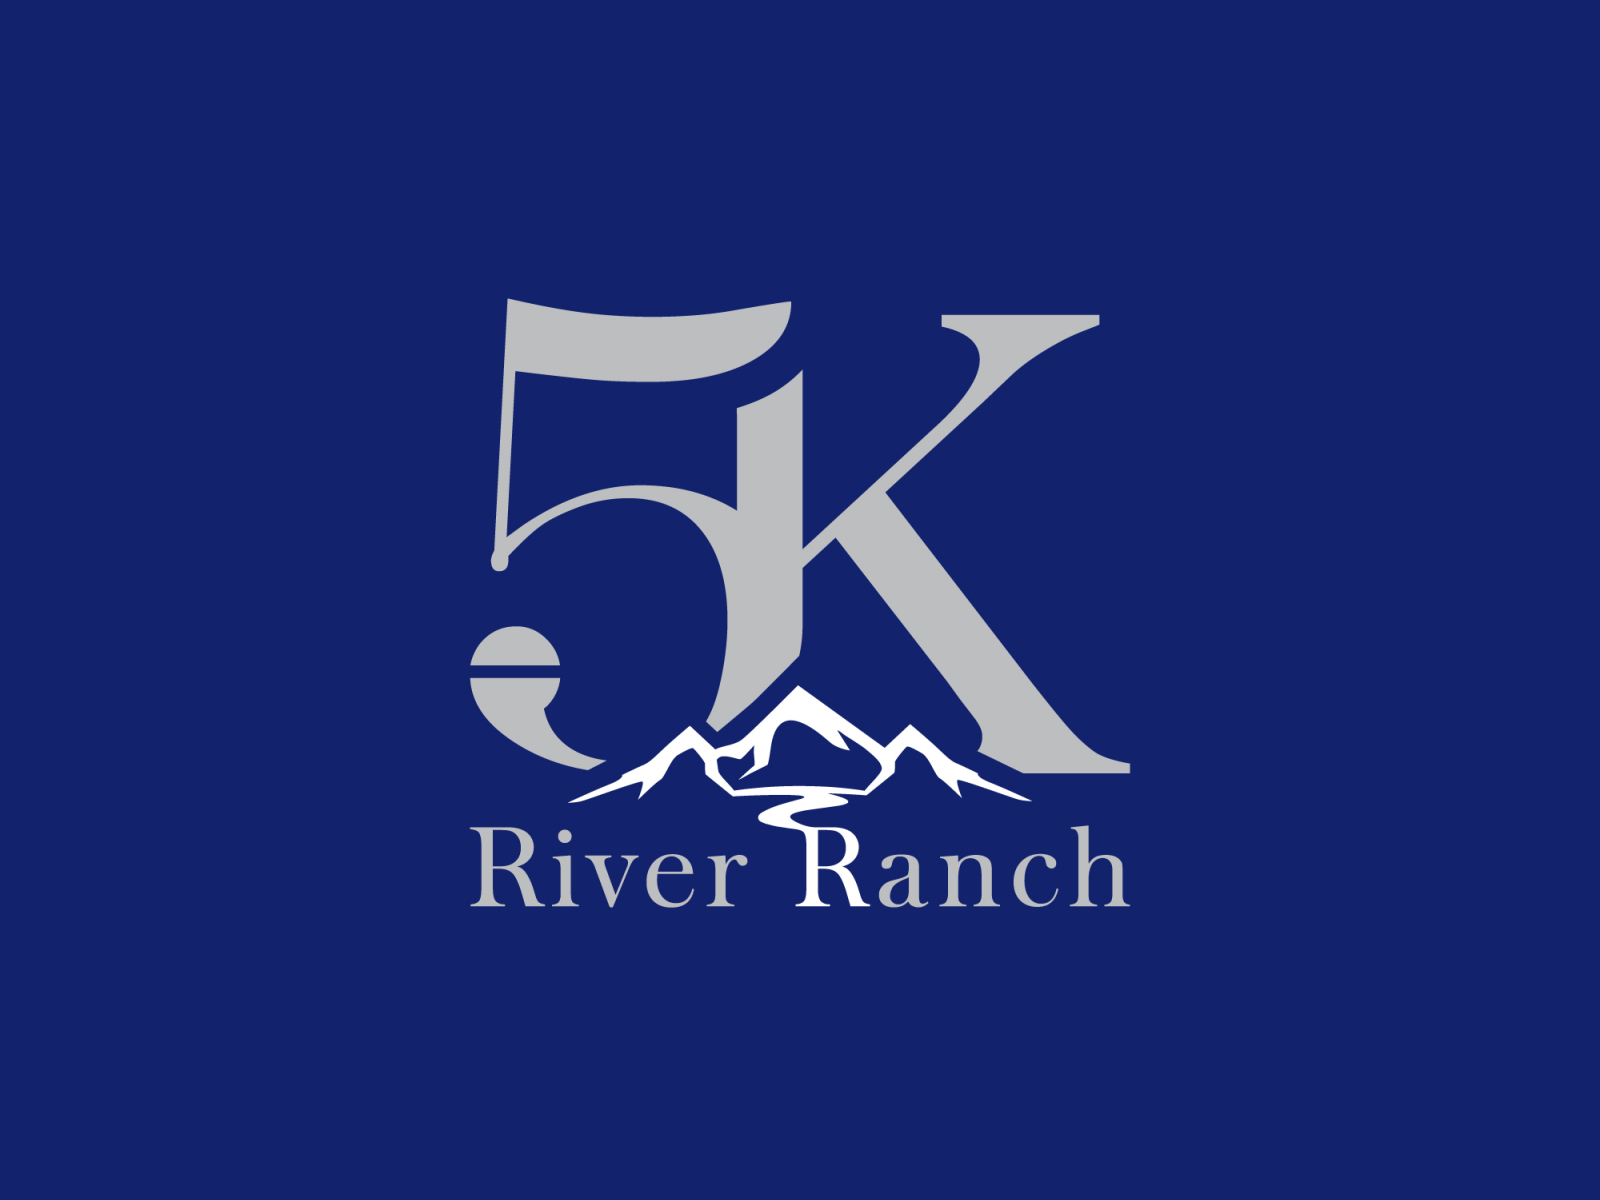 5K River Ranch logo design by Andrijana Miladinovic on Dribbble on country home designers, ranch interior design, lake home designers, craftsman home designers, ranch house plans, ranch floor plans, ranch painting, mediterranean home designers, ranch tools, ranch signs, ranch log homes, modern home designers, custom home designers, french home designers, ranch doors, ranch fences, ranch decks, log home designers, ranch blueprints, residential home designers,